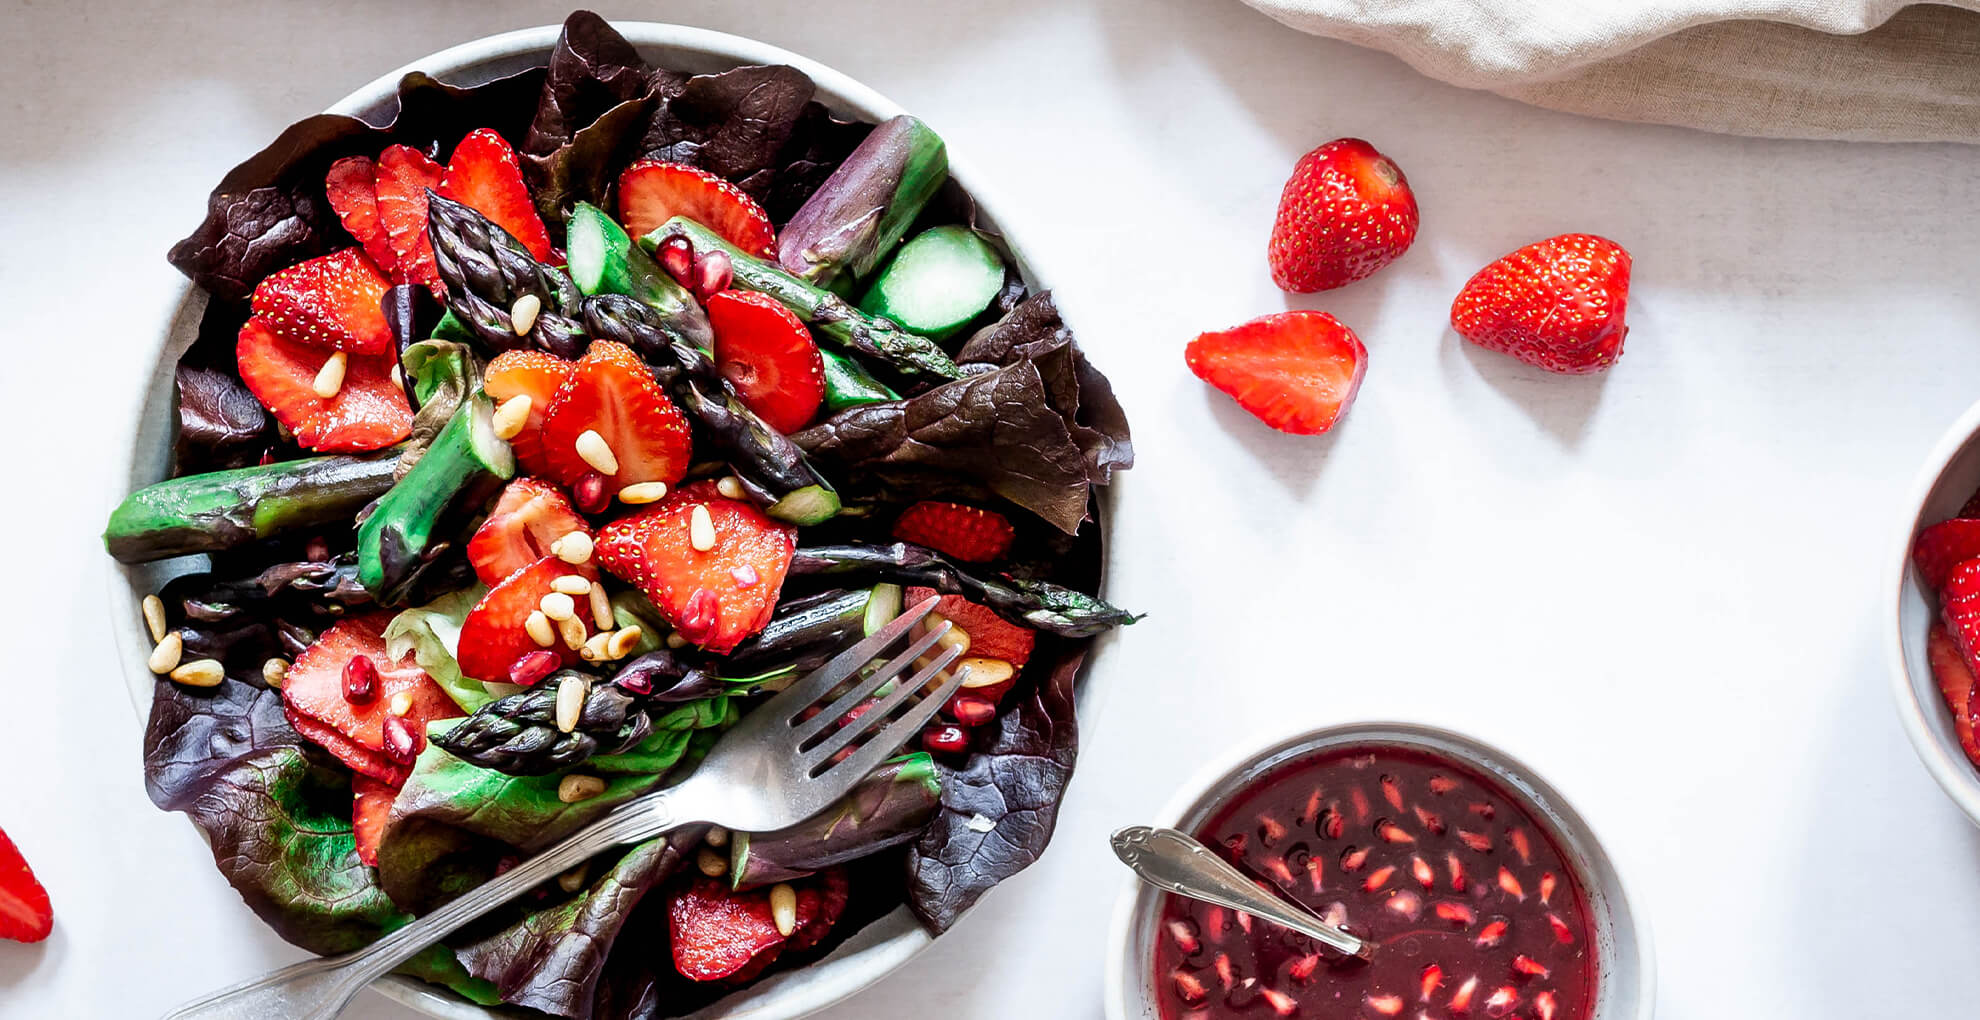 Spargel-Erdbeer-Salat mit Granatapfel-Vinaigrette